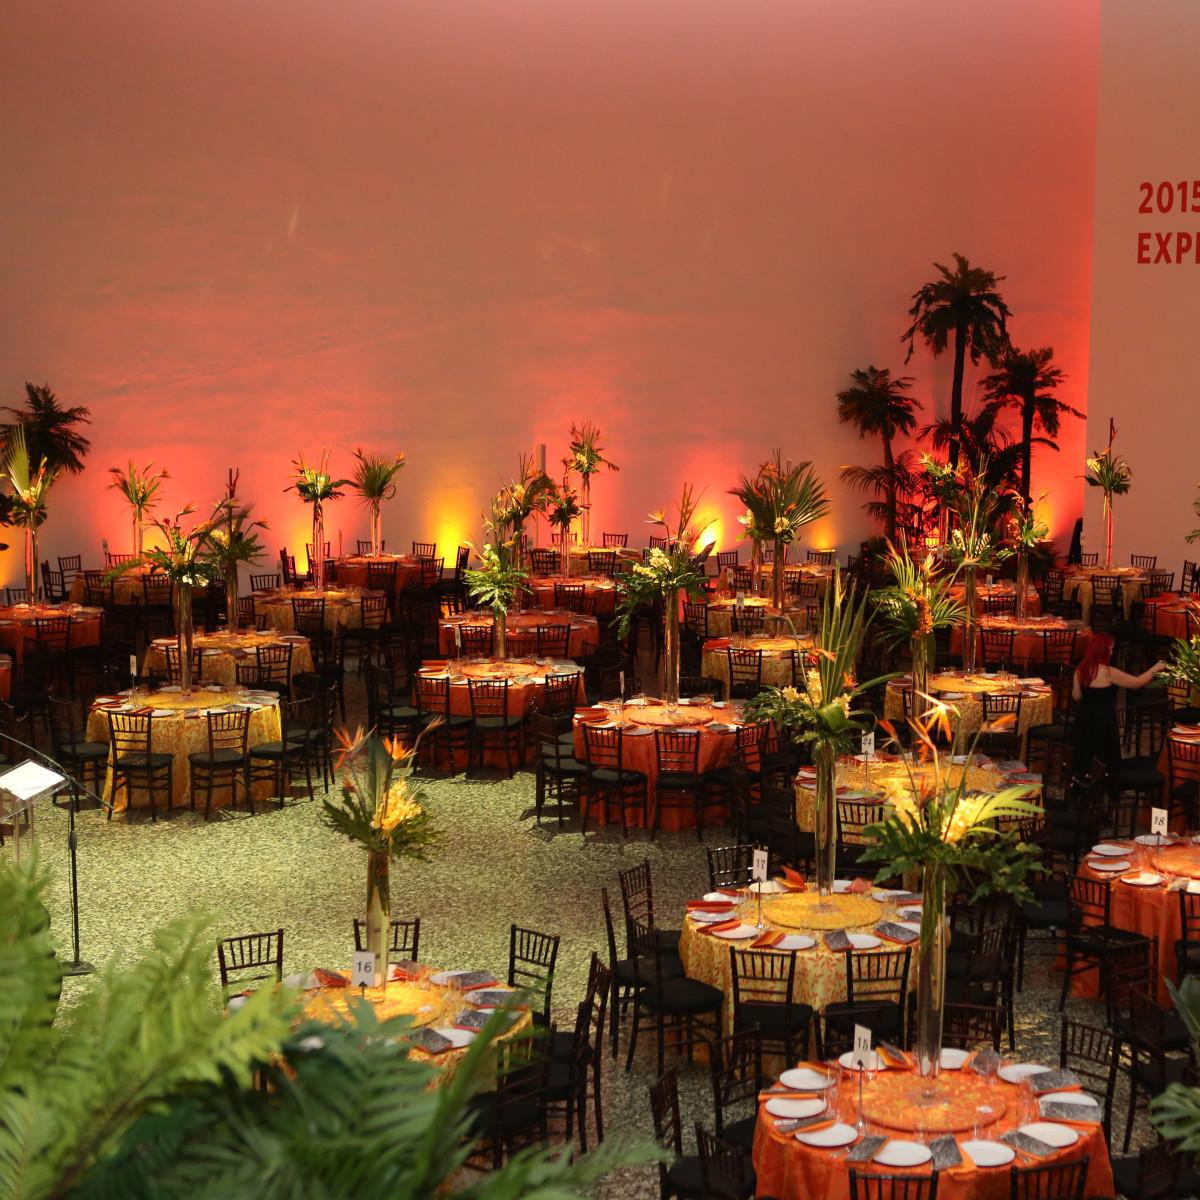 News, MFAH Latin Experience, Nov. 2015 Cullinan Hall